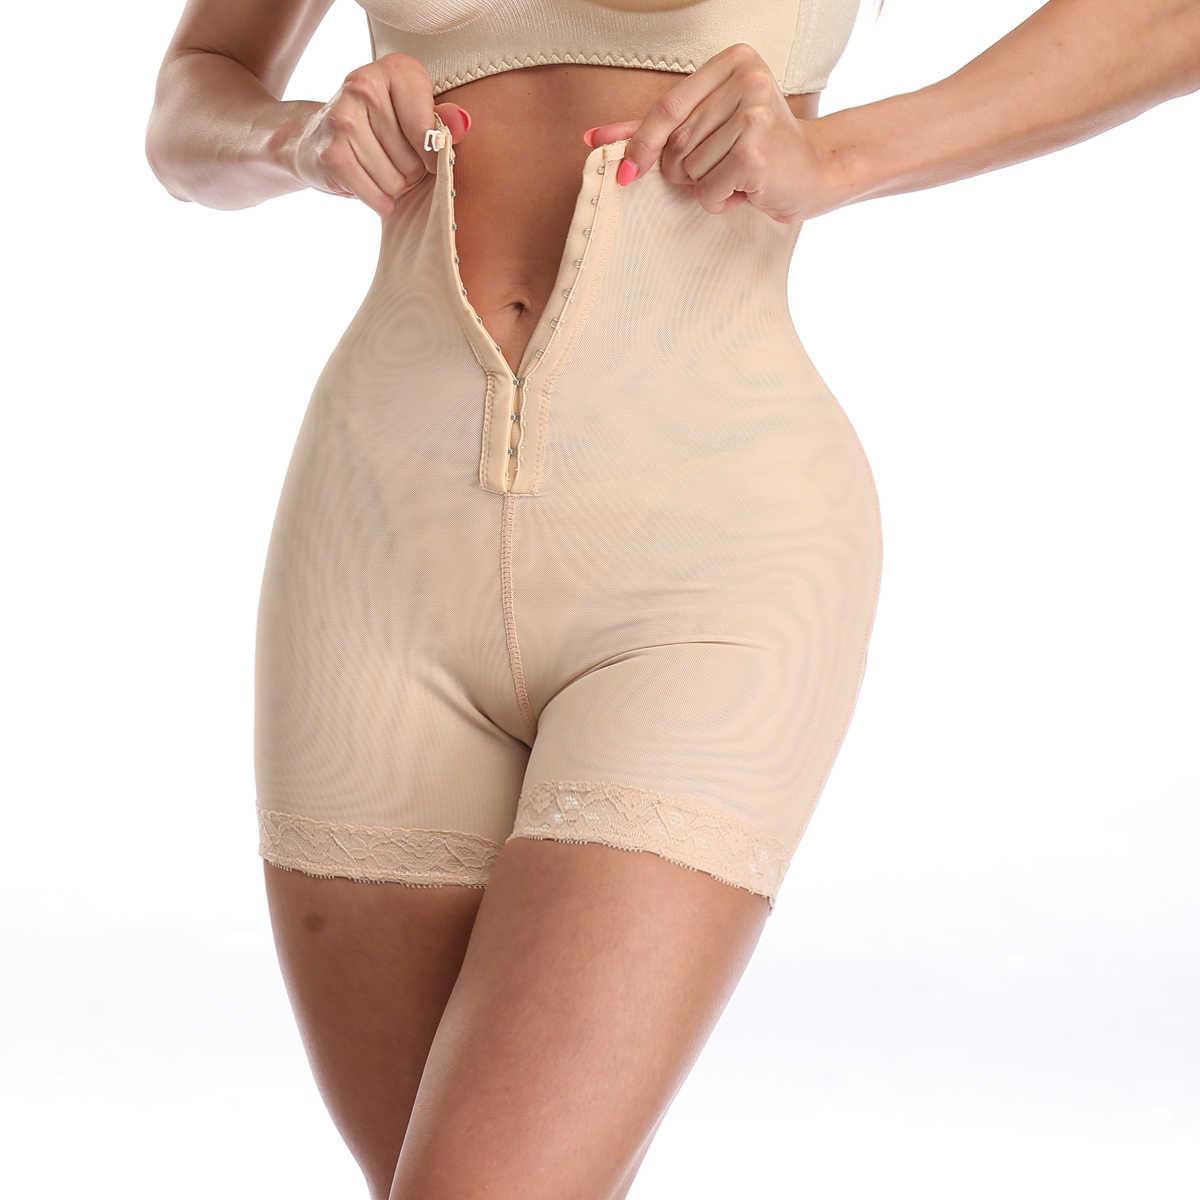 Rompers ผู้หญิง Jumpsuit Body Shape เอวเทรนเนอร์ Corrective หลังคลอด Tummy Slimming Abdomen ชุดบอดี้สูทพลัสขนาด 6XL Shapewear